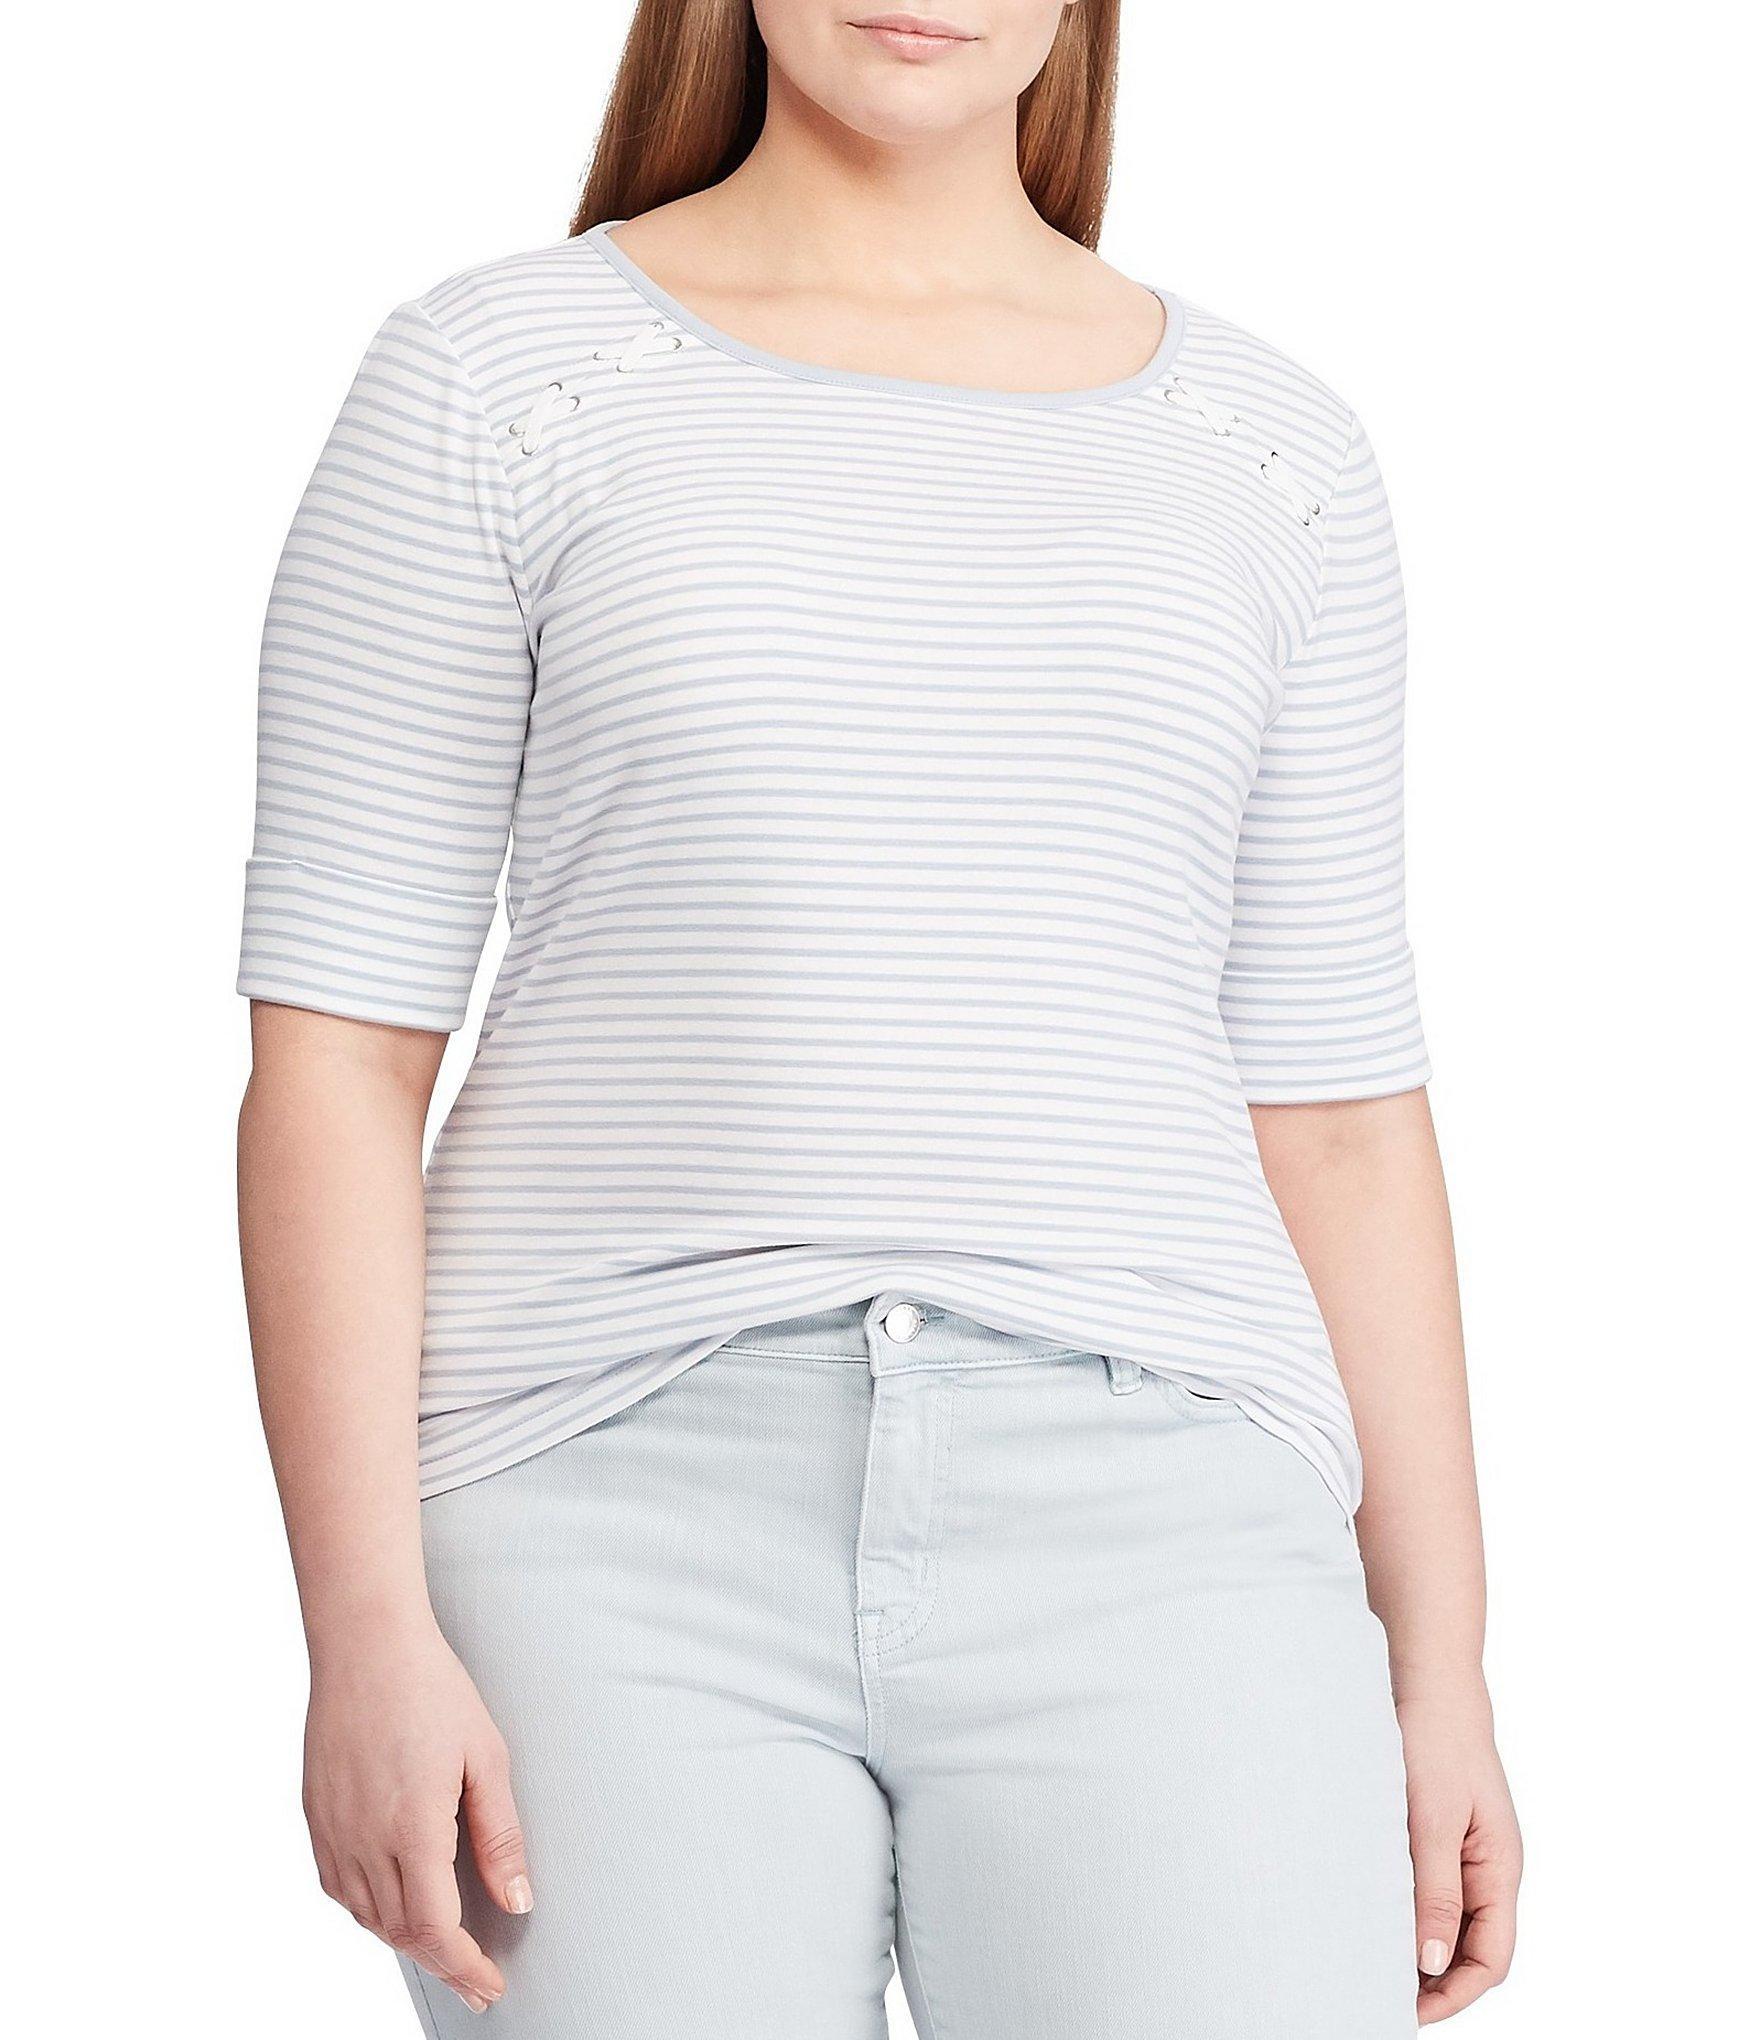 dd2c3e14ef9 Lyst - Lauren by Ralph Lauren Plus Size Striped Cotton Top in White